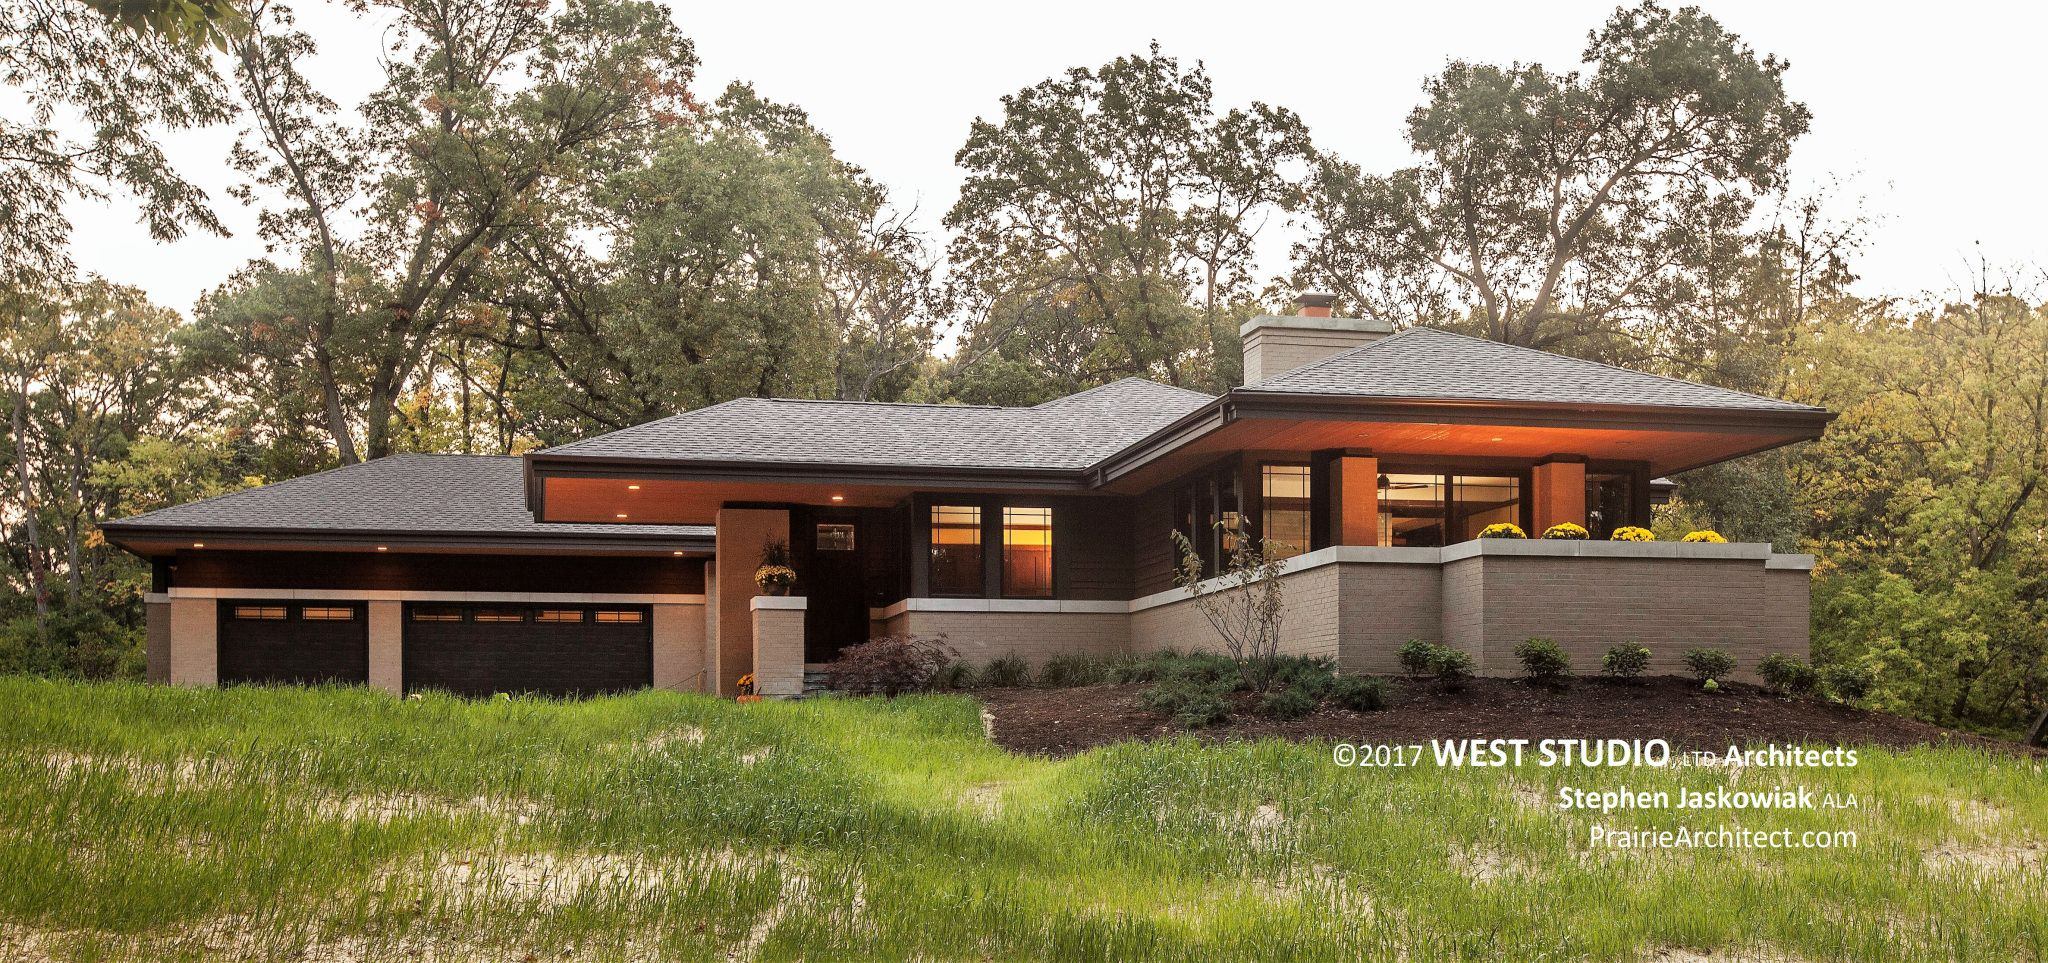 Modern Prairie Home Frank Lloyd Wright Inspired West Studio Architects Stephen Jaskowiak Prairie Style Houses Modern Prairie Home Prairie Style Architecture